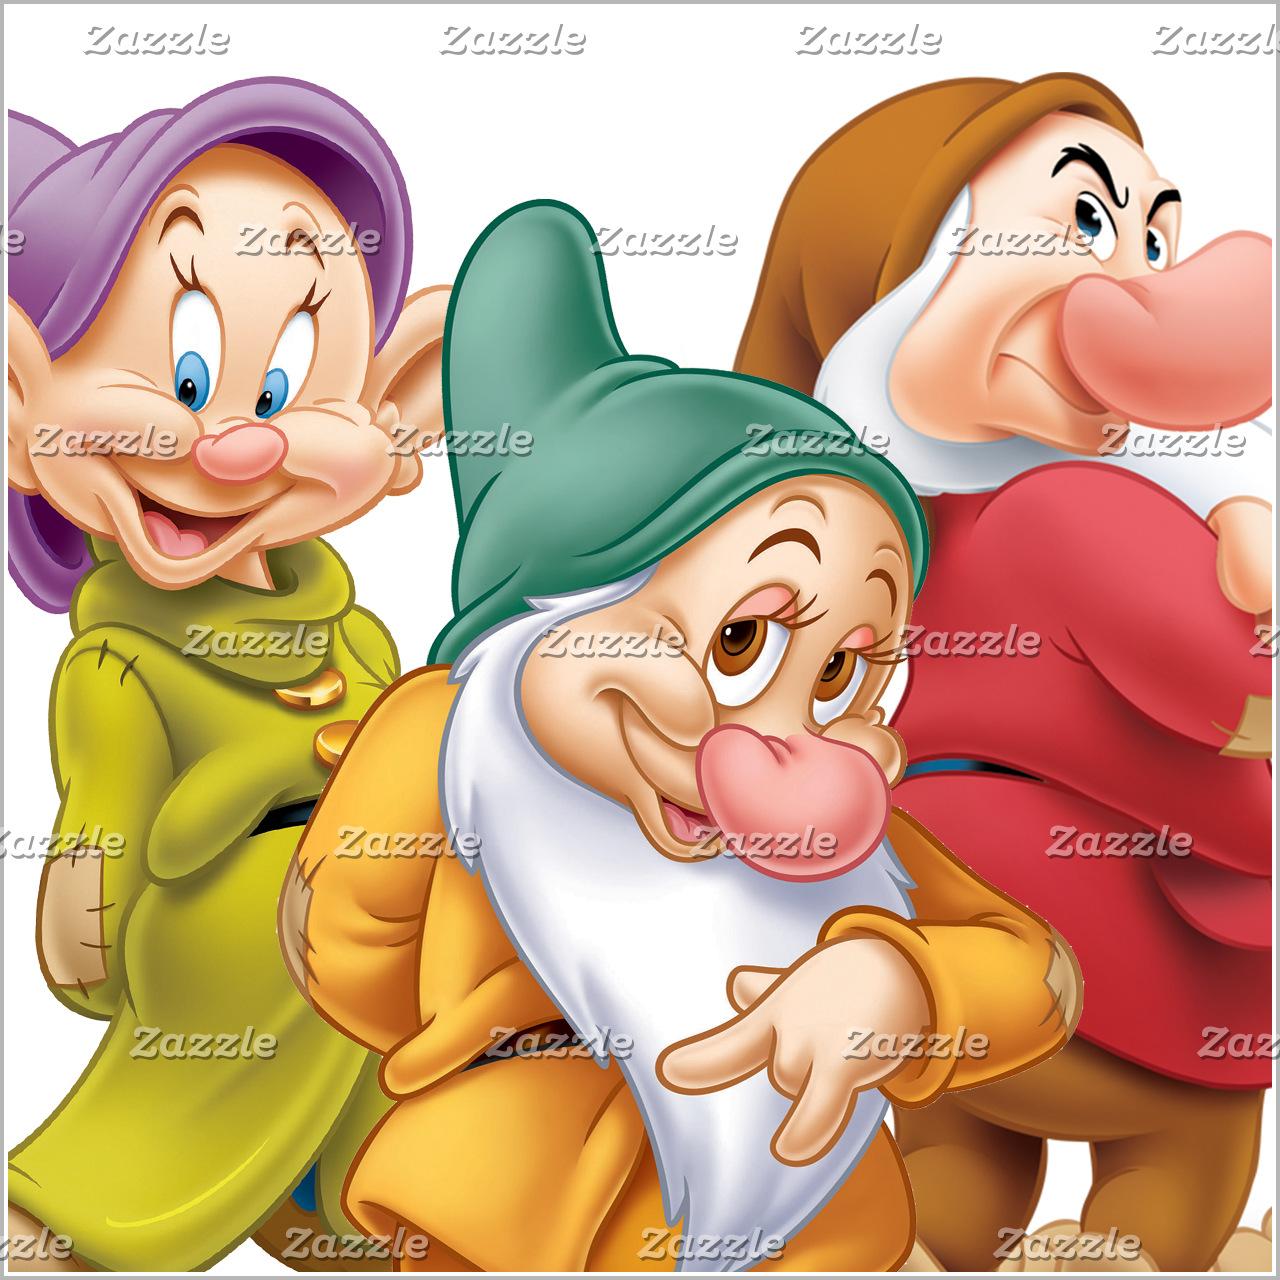 Disney's Seven Dwarfs